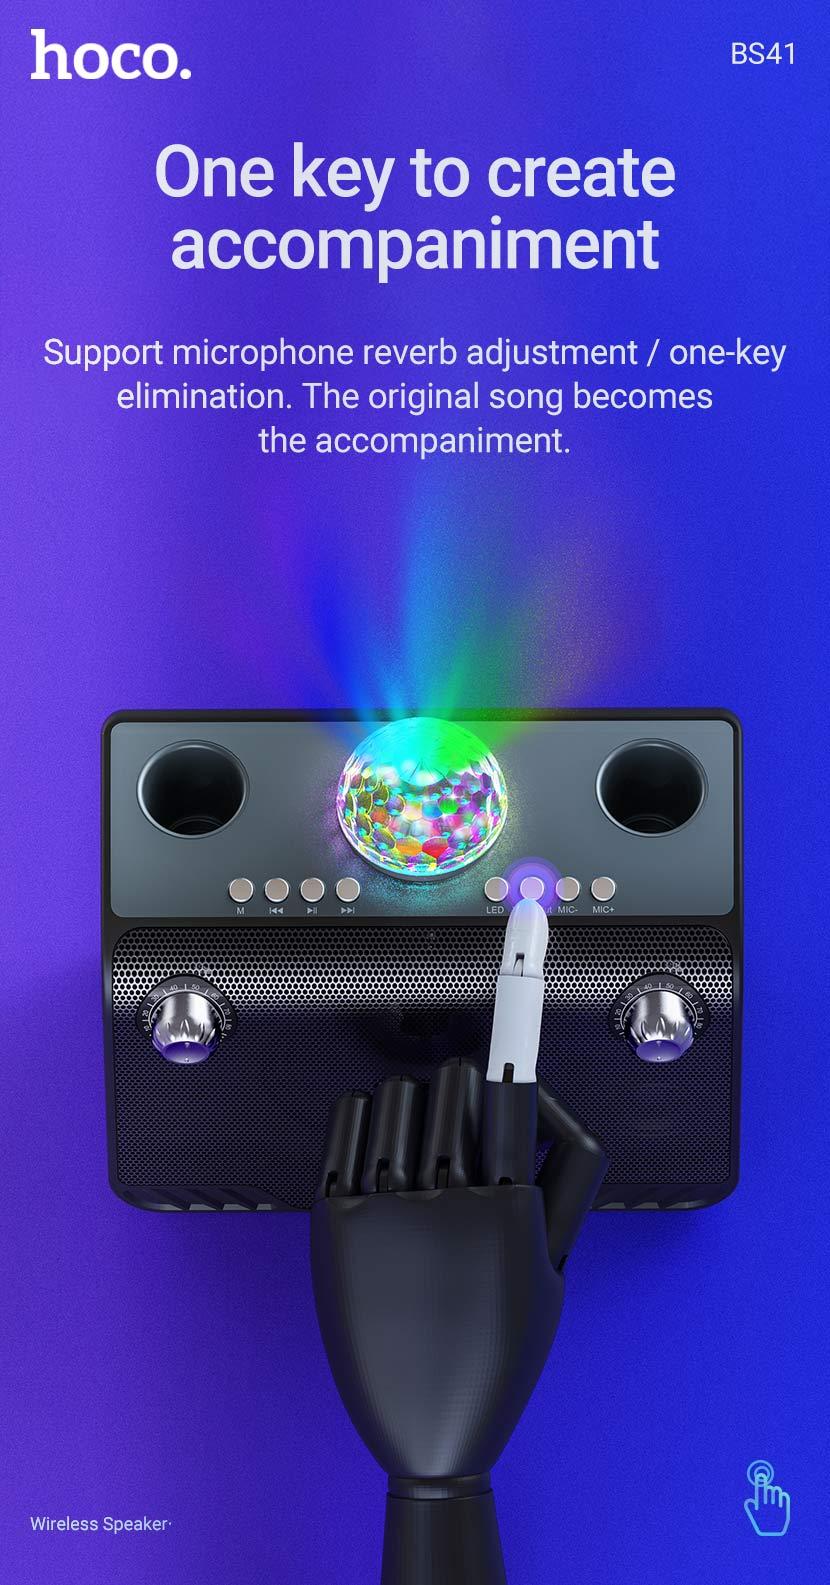 hoco news bs41 warm sound k song wireless speaker accompaniment en